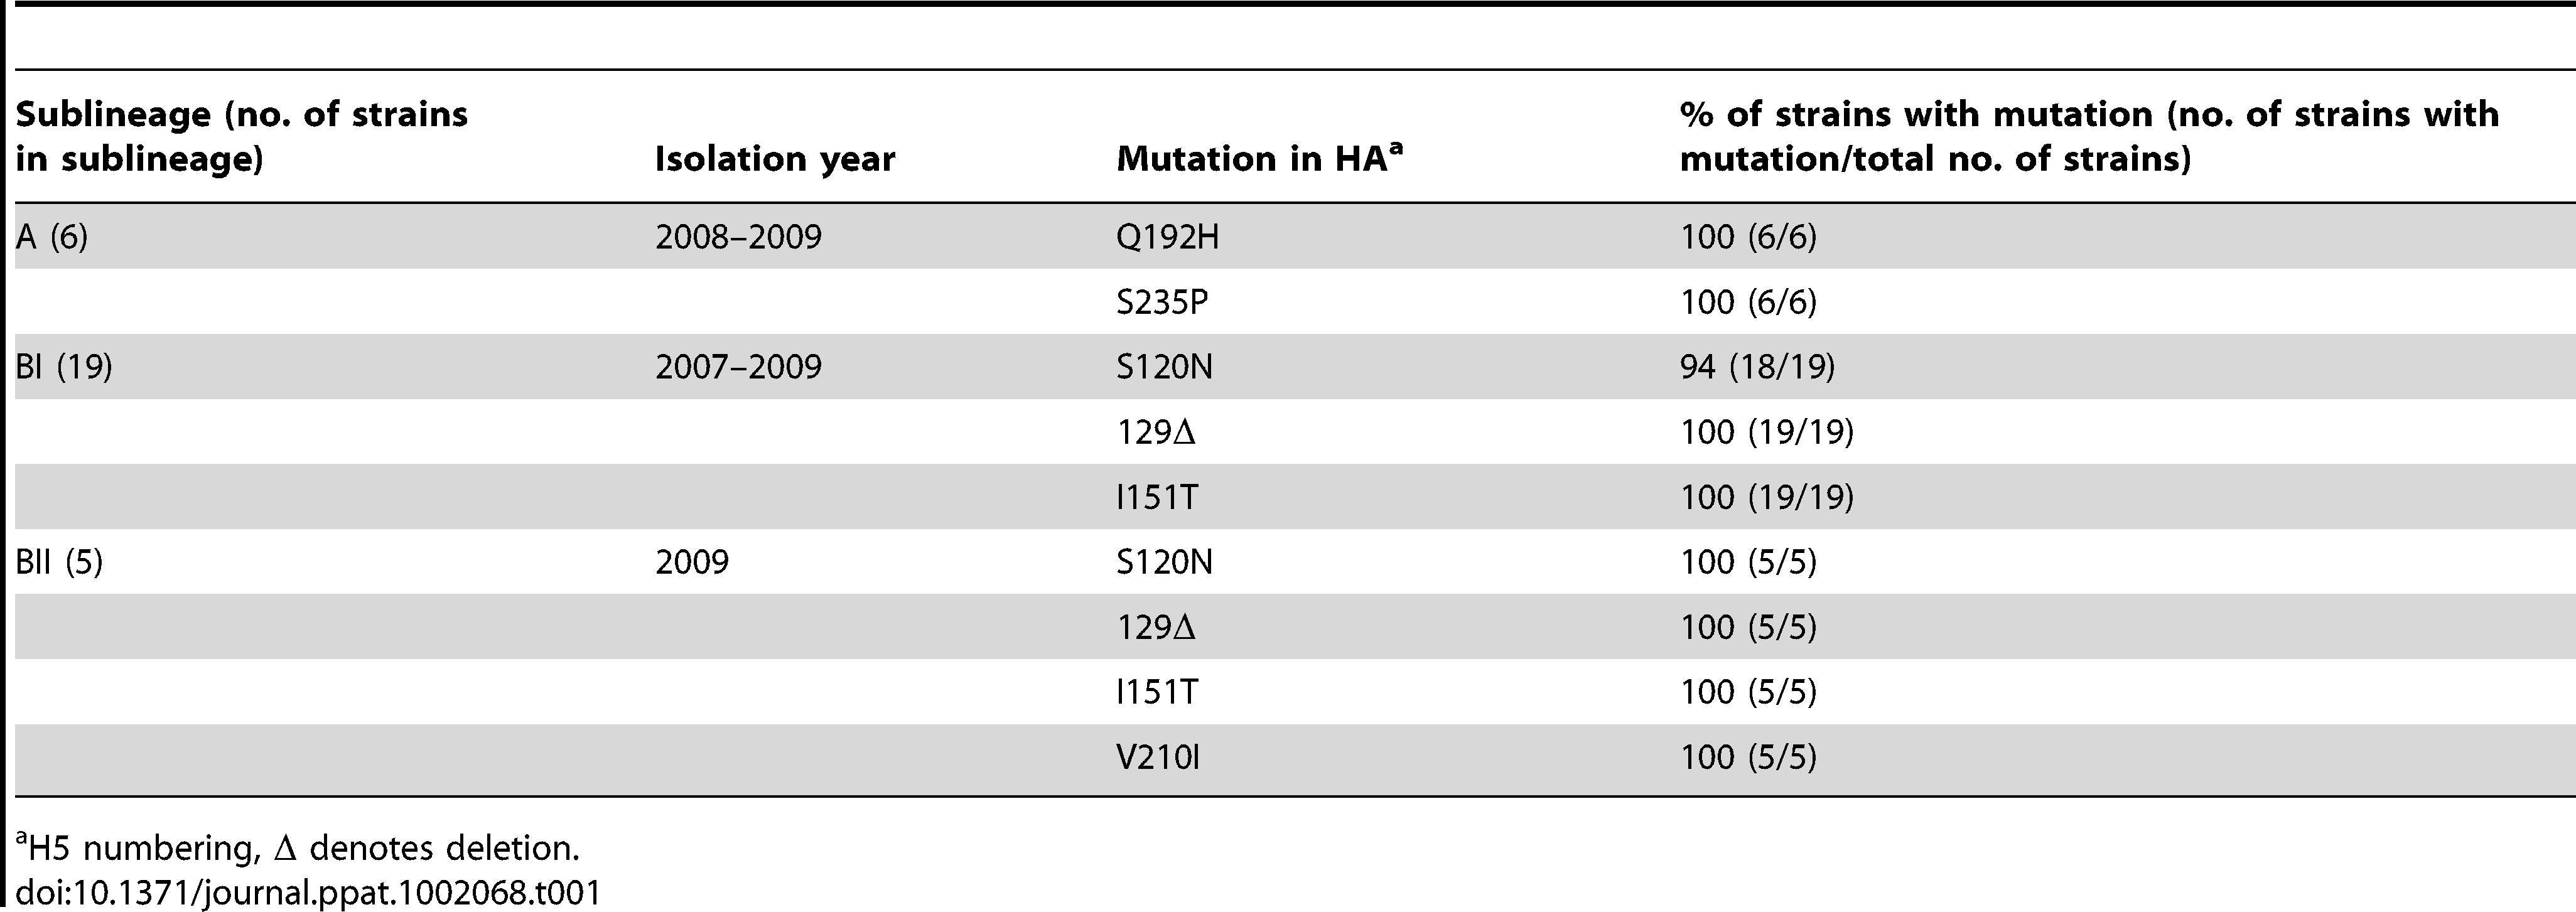 Mutations in HA genes in H5 viruses in sublineages A, BI and BII.